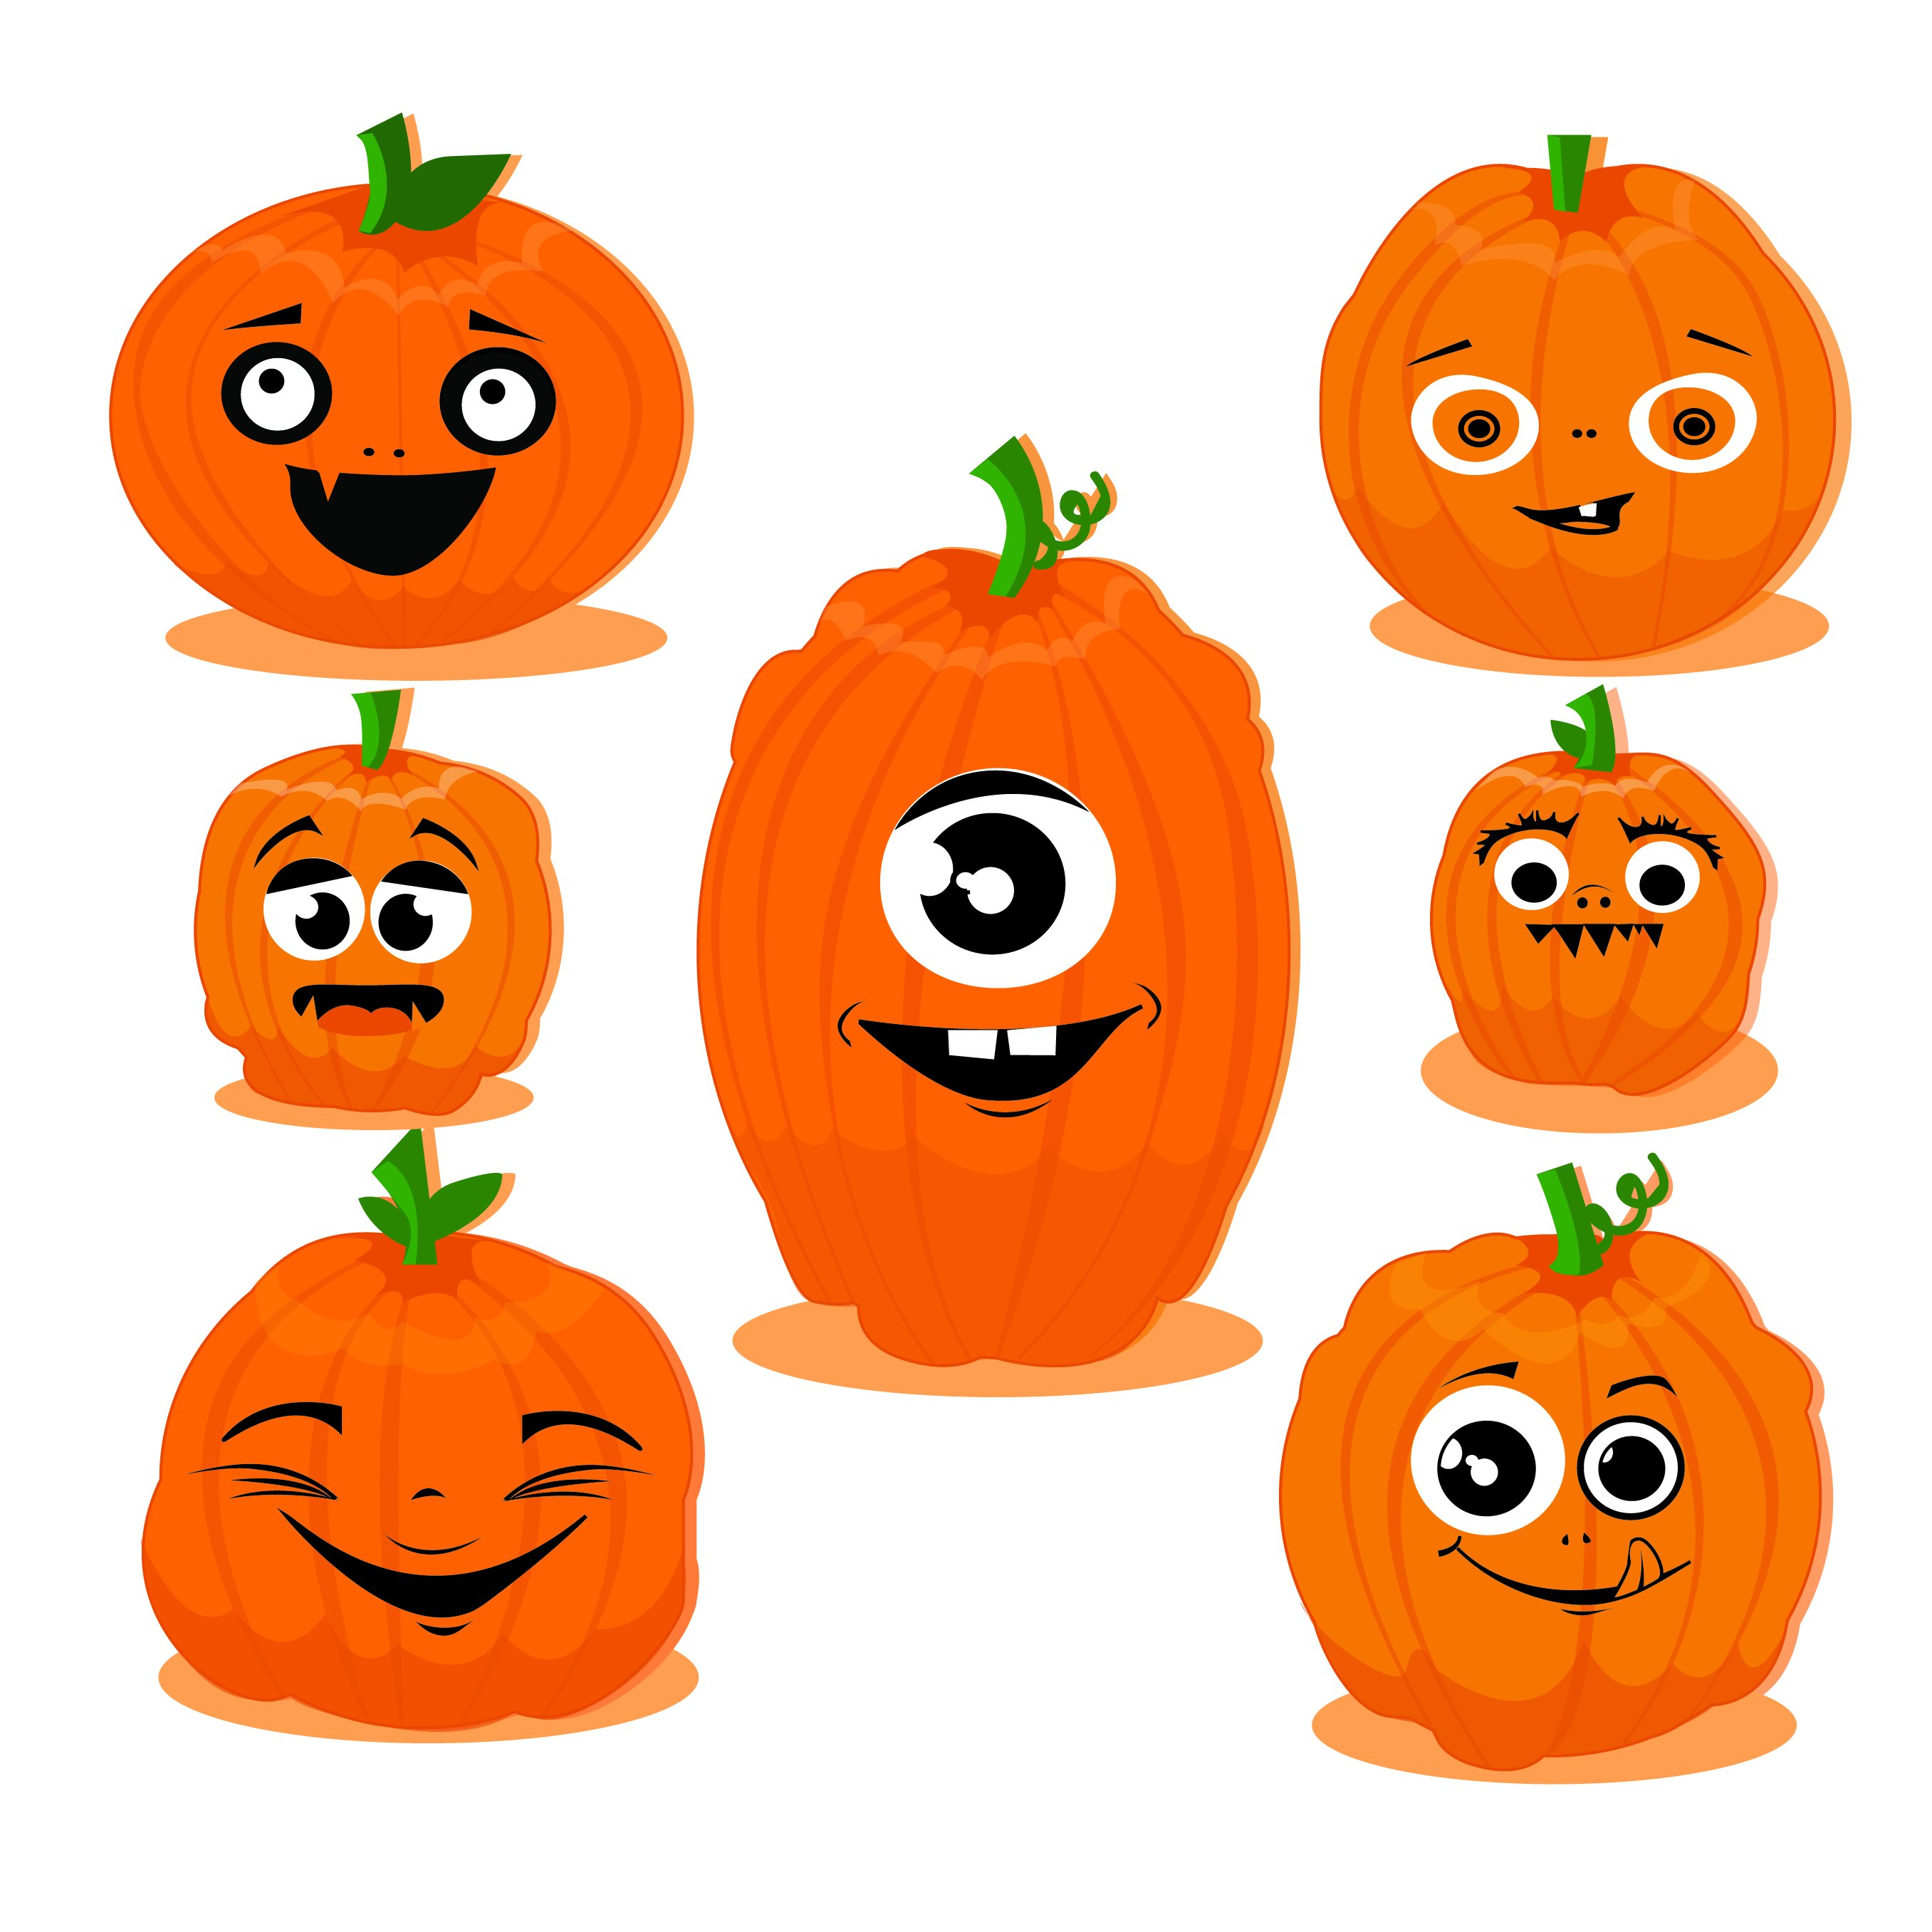 Funny pumpkins clipart | Custom-Designed Illustrations ...